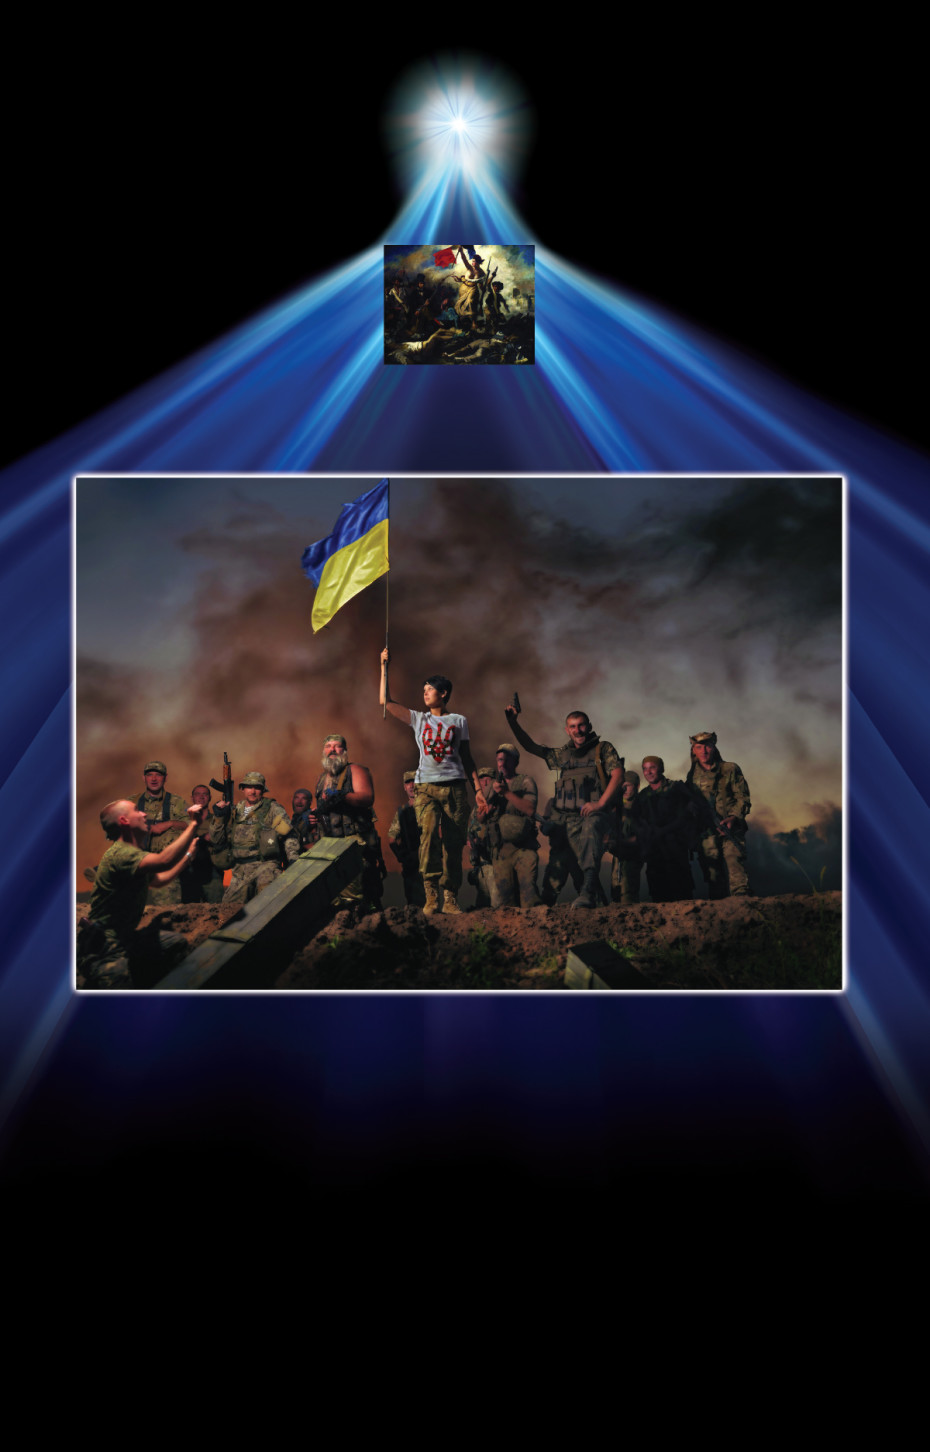 Ежен Делакруа «Свобода, що веде народ» (1830)